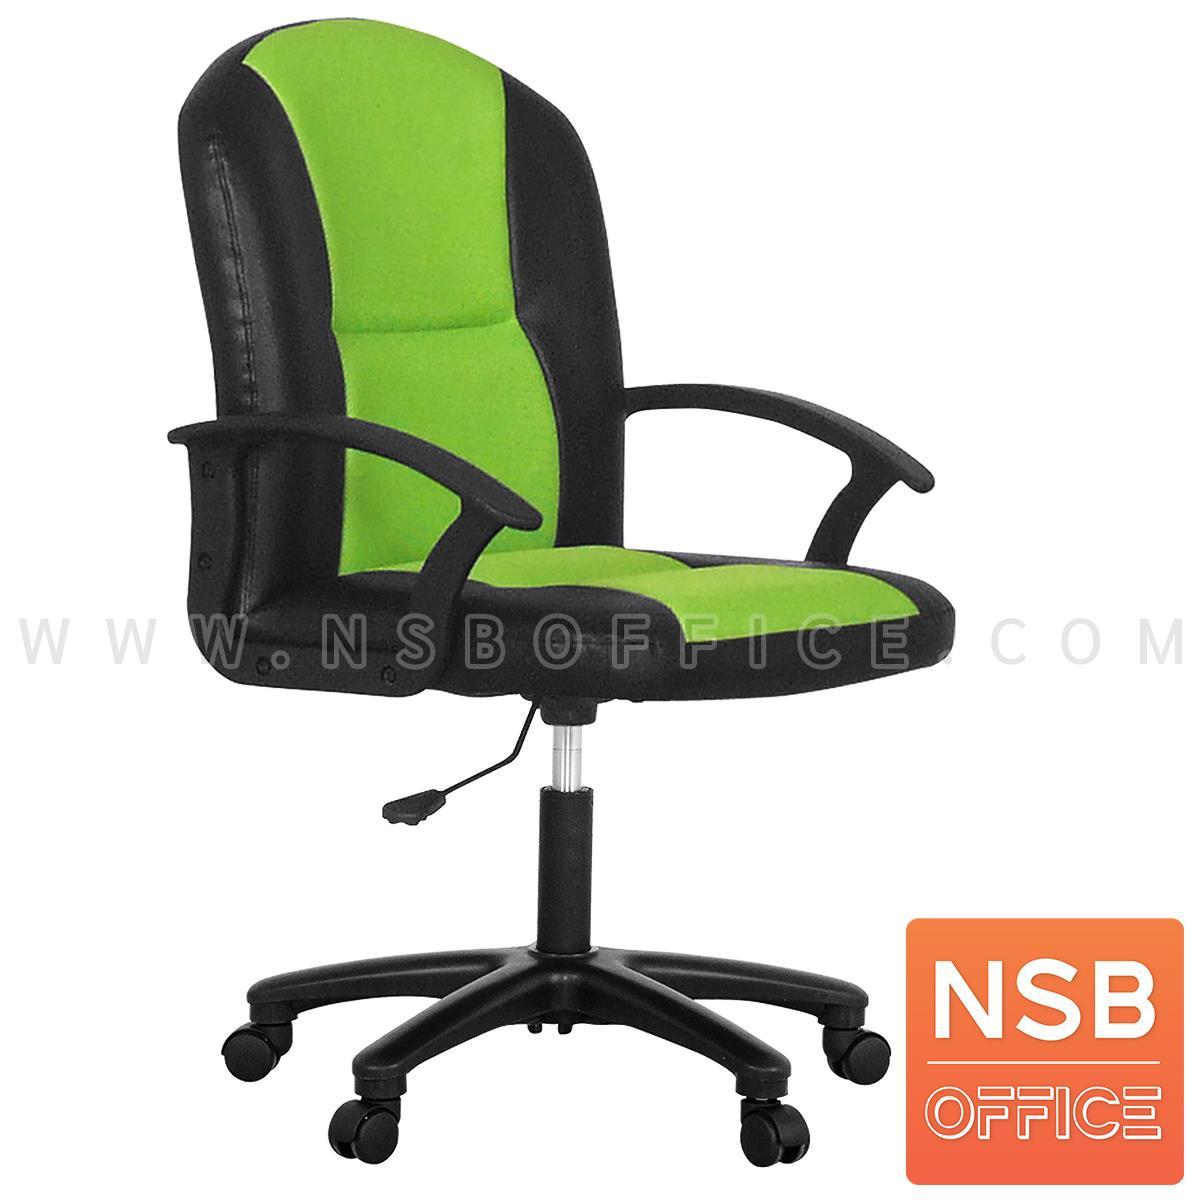 B03A517:เก้าอี้สำนักงาน รุ่น Comviq (คอมวิค)  โช็คแก๊ส ขาพลาสติก